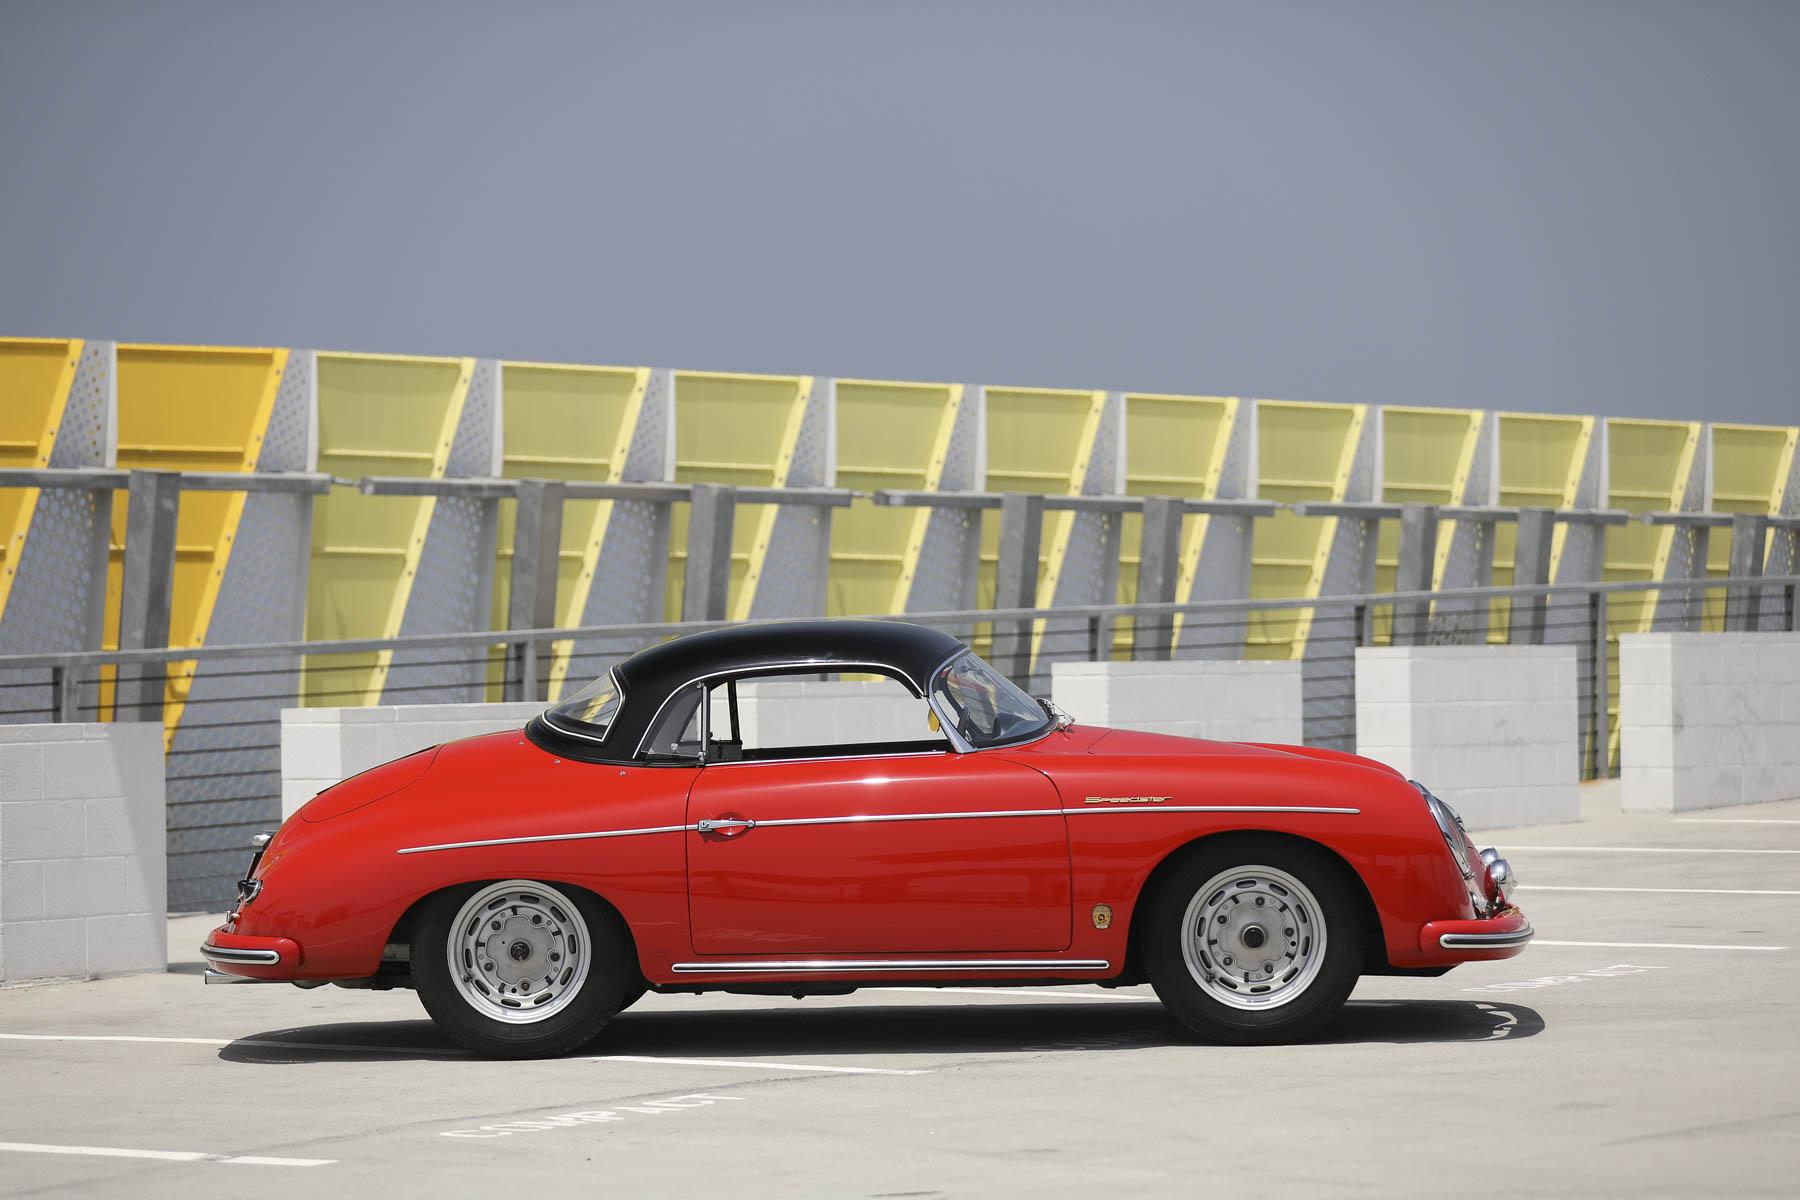 1957 Porsche 356 A Speedster profile